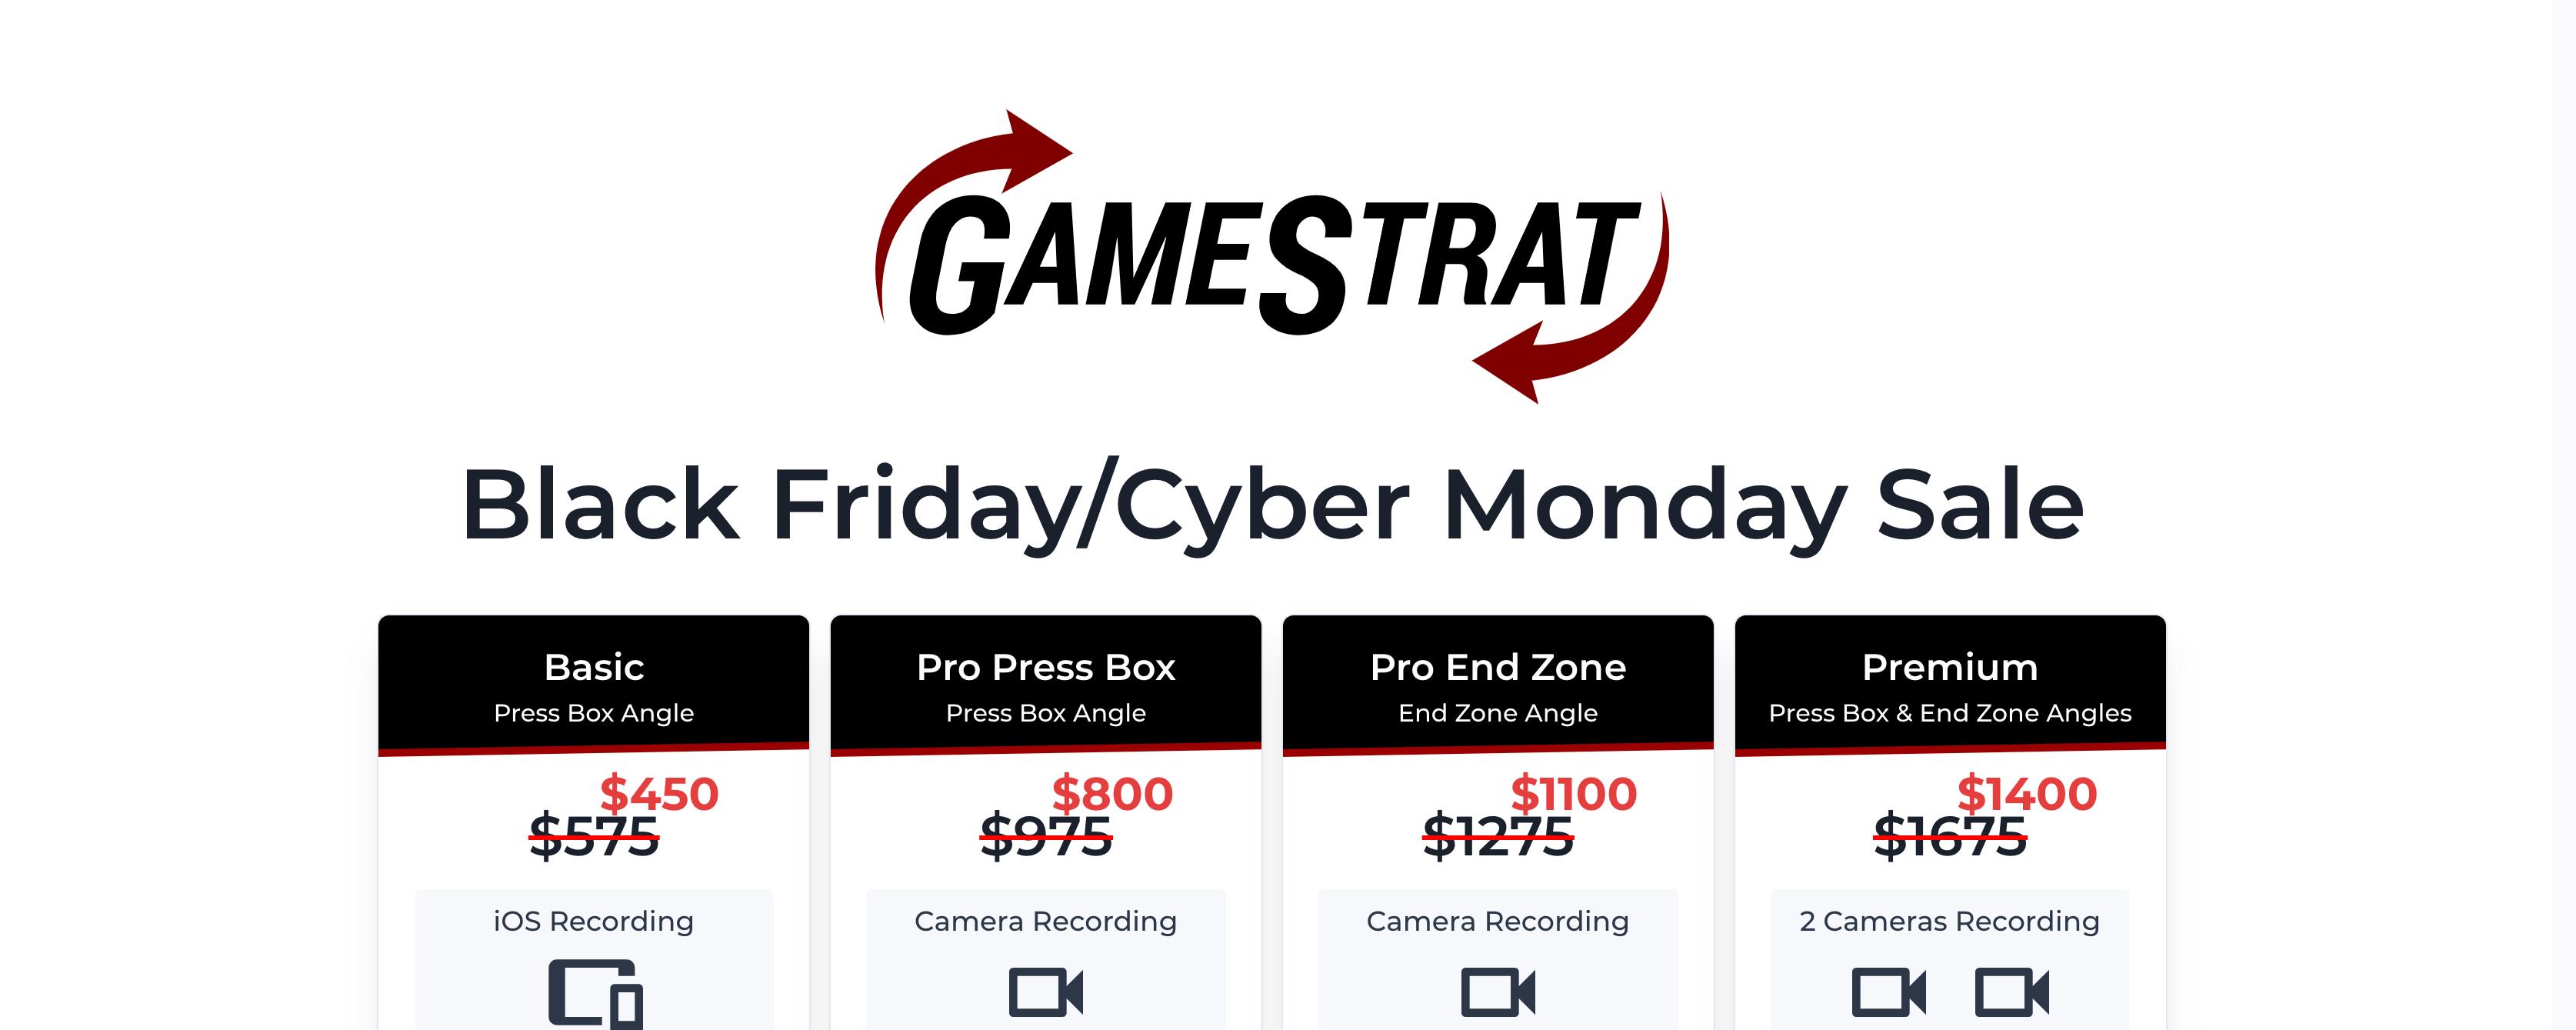 GameStrat Black Friday/ Cyber Monday Sale